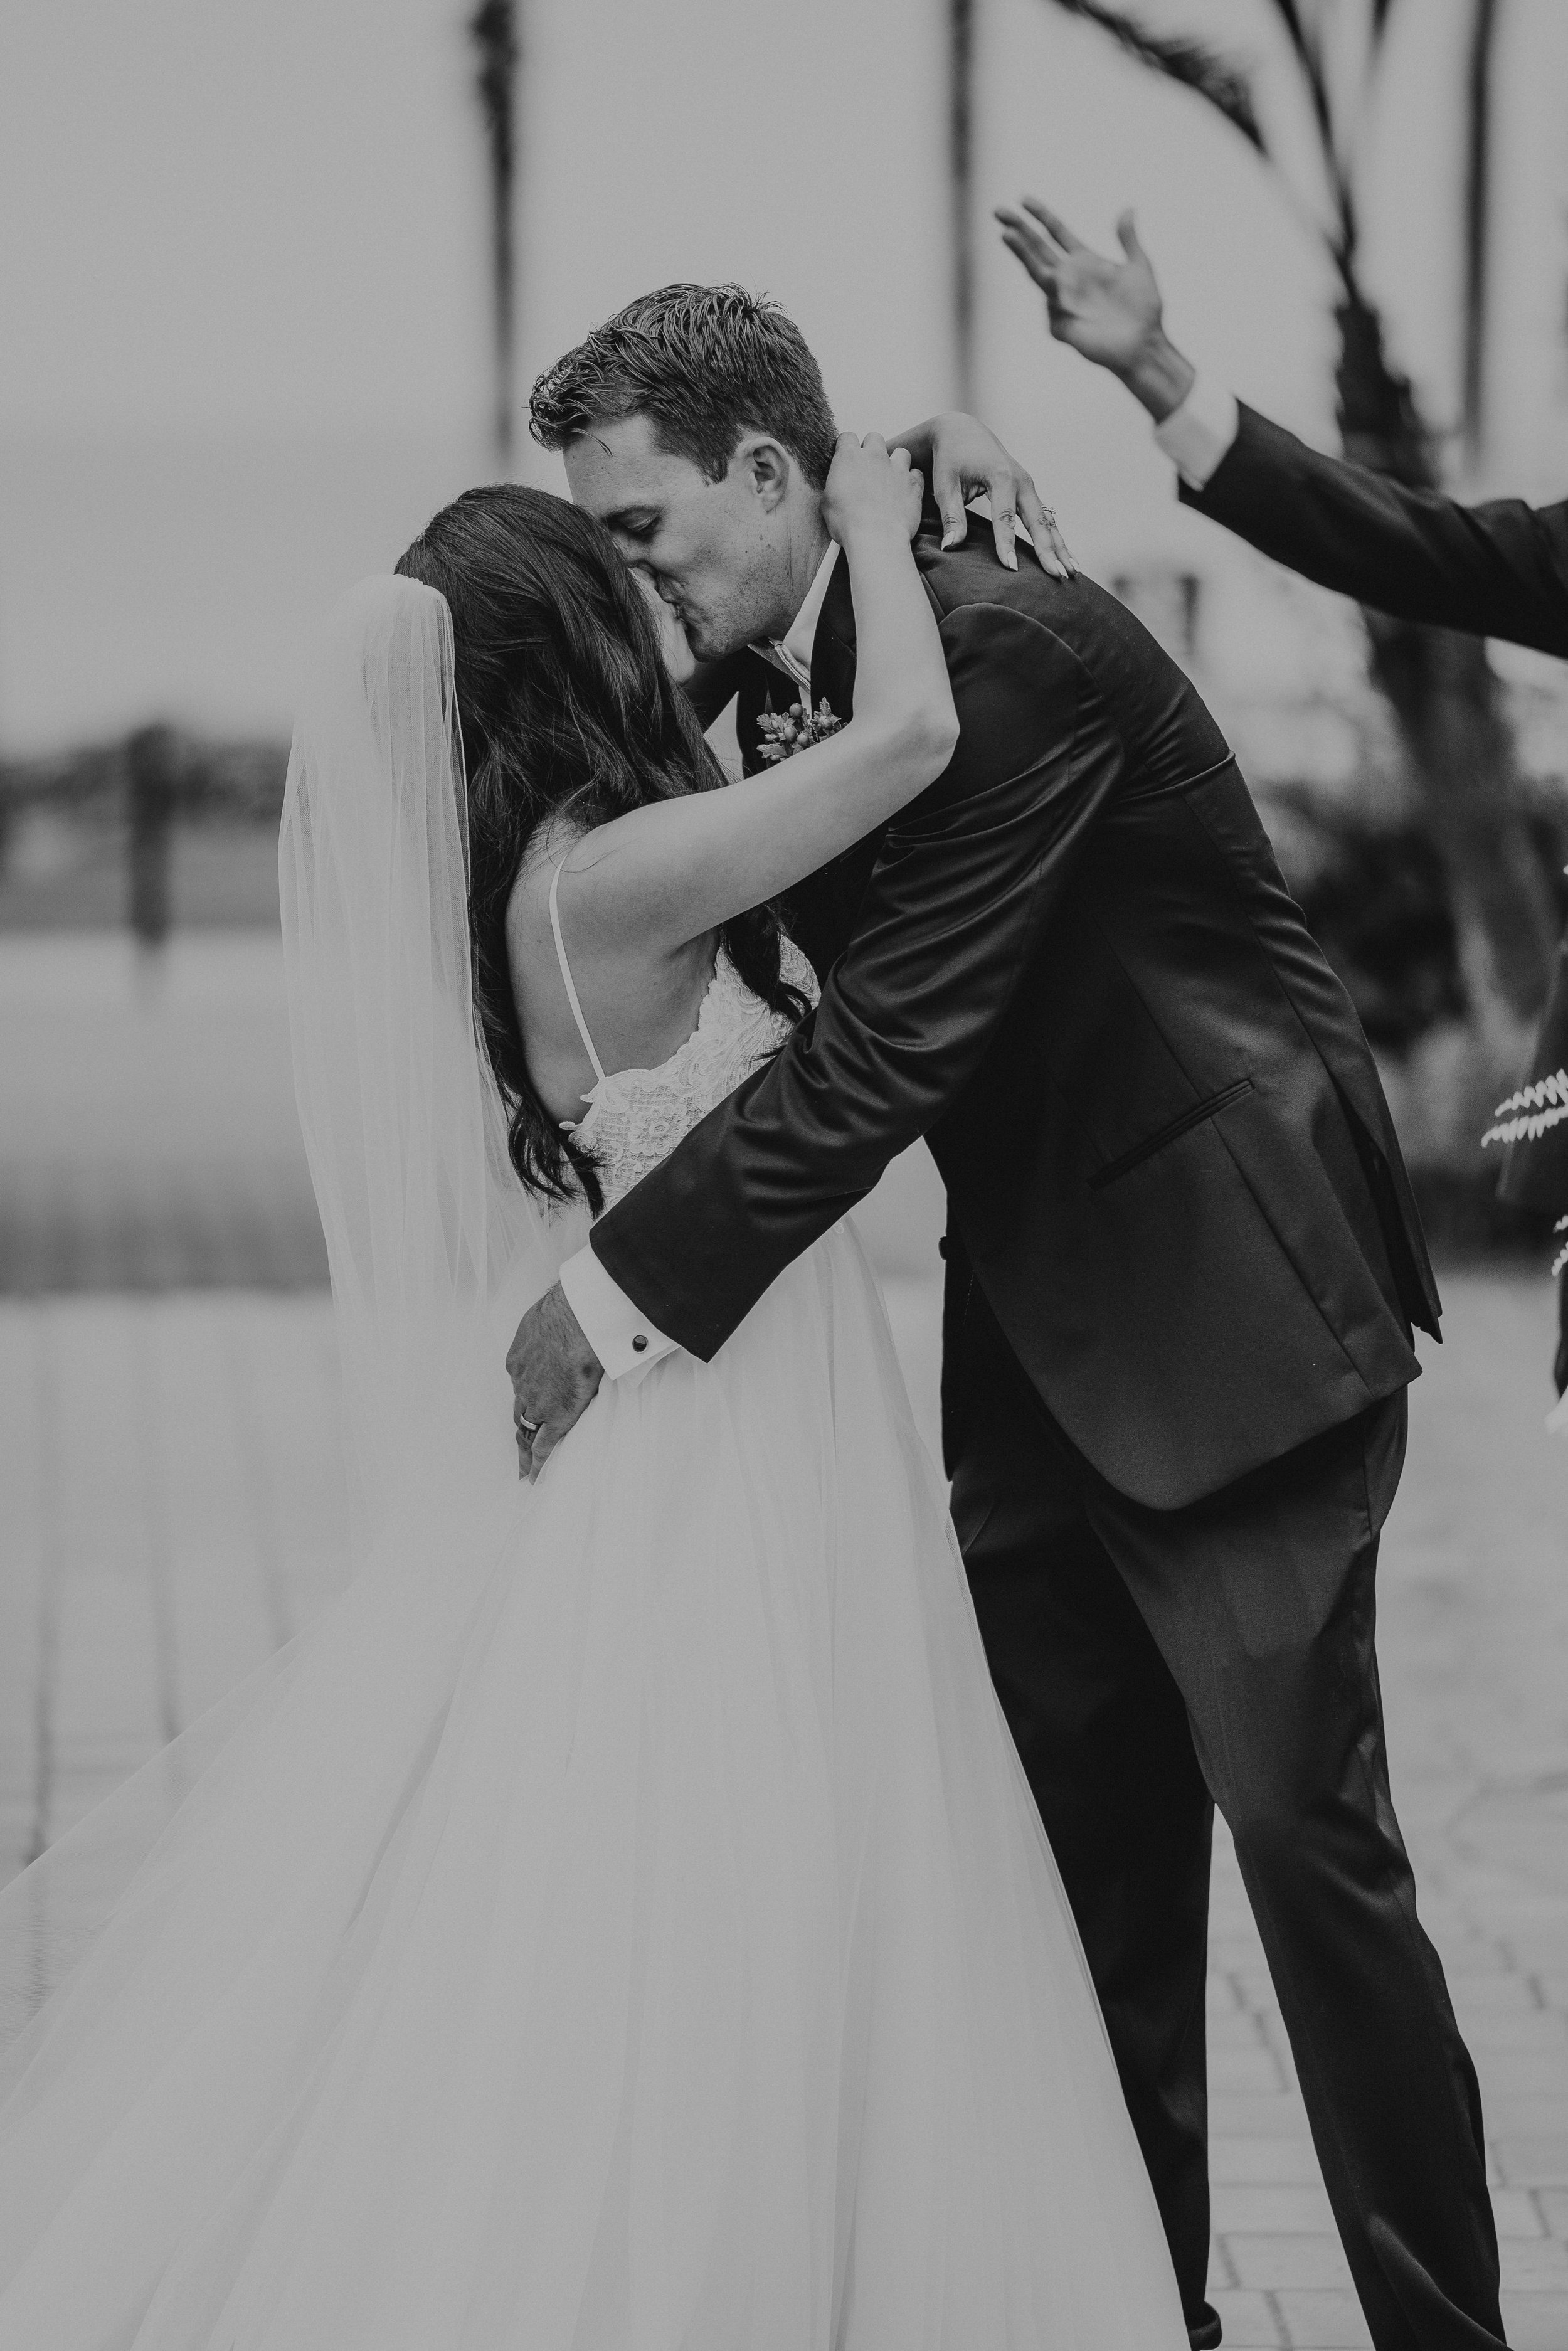 www.santabarbarawedding.com | Candice Marie Photography | Hilton Santa Barbara Beachfront Resort | Dalina Klan | Once in a Lifetime Weddings | Anthony Francisco | Bride and Groom First Kiss